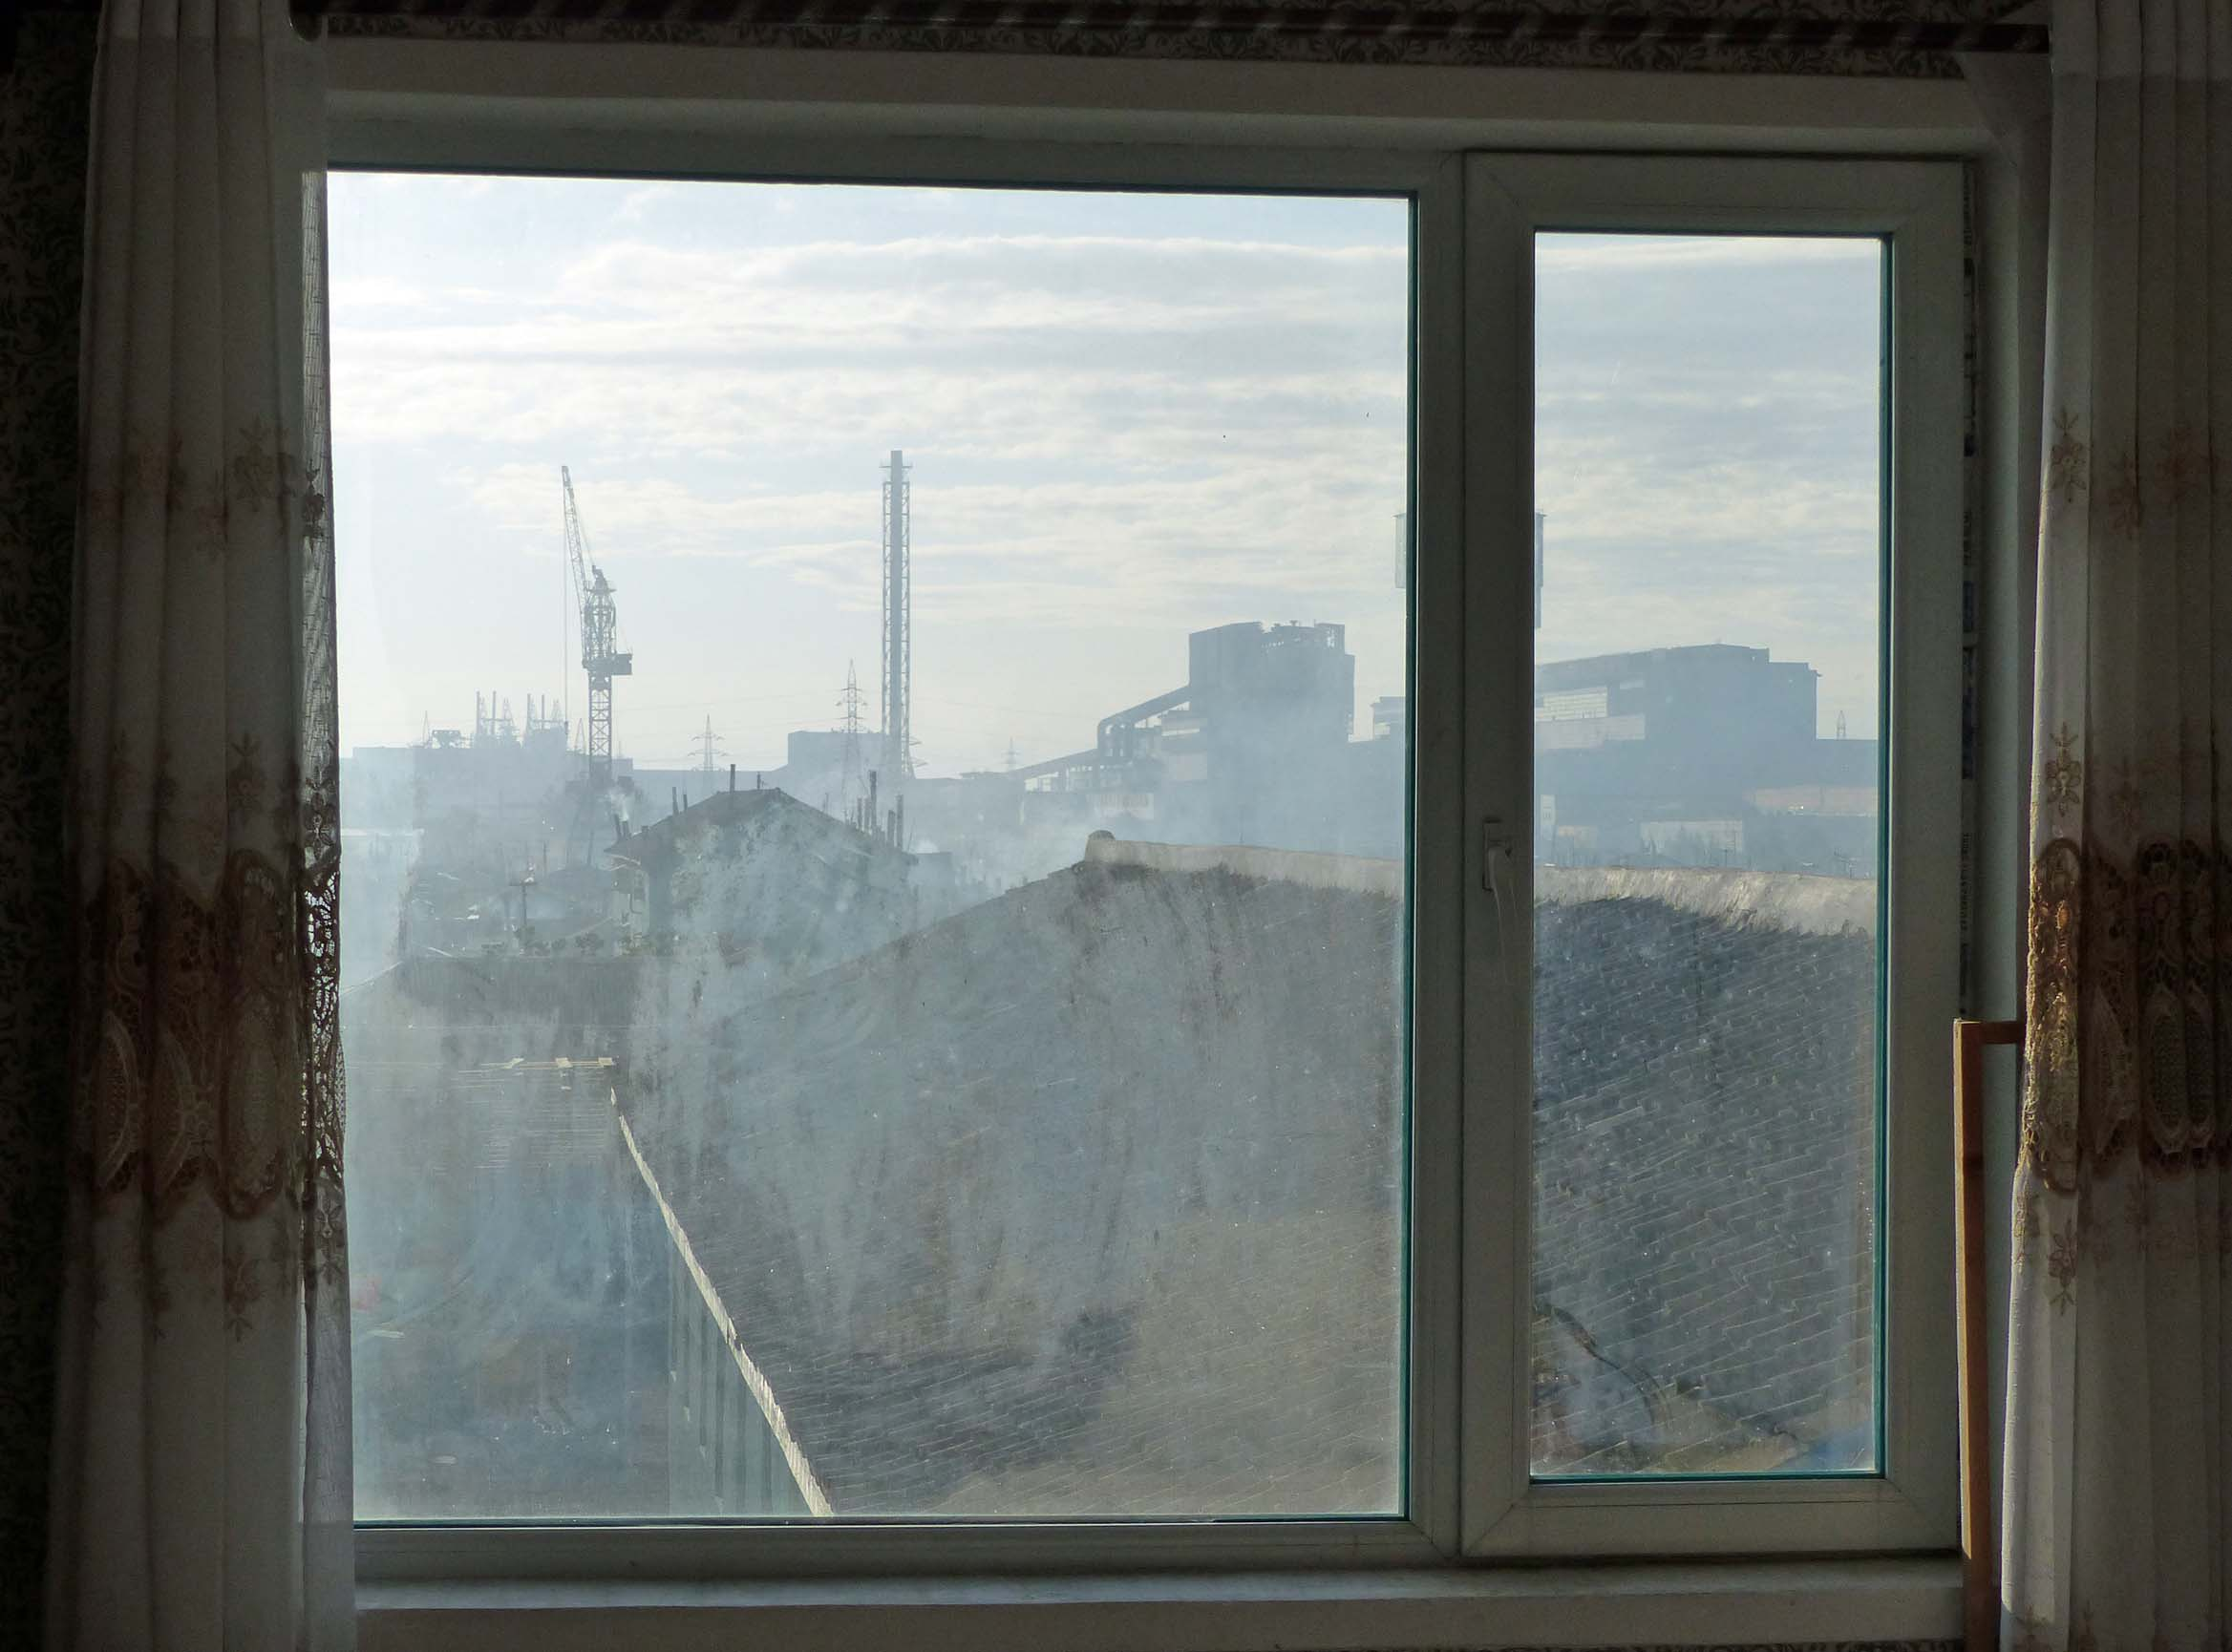 Dirty window and industrial skyline